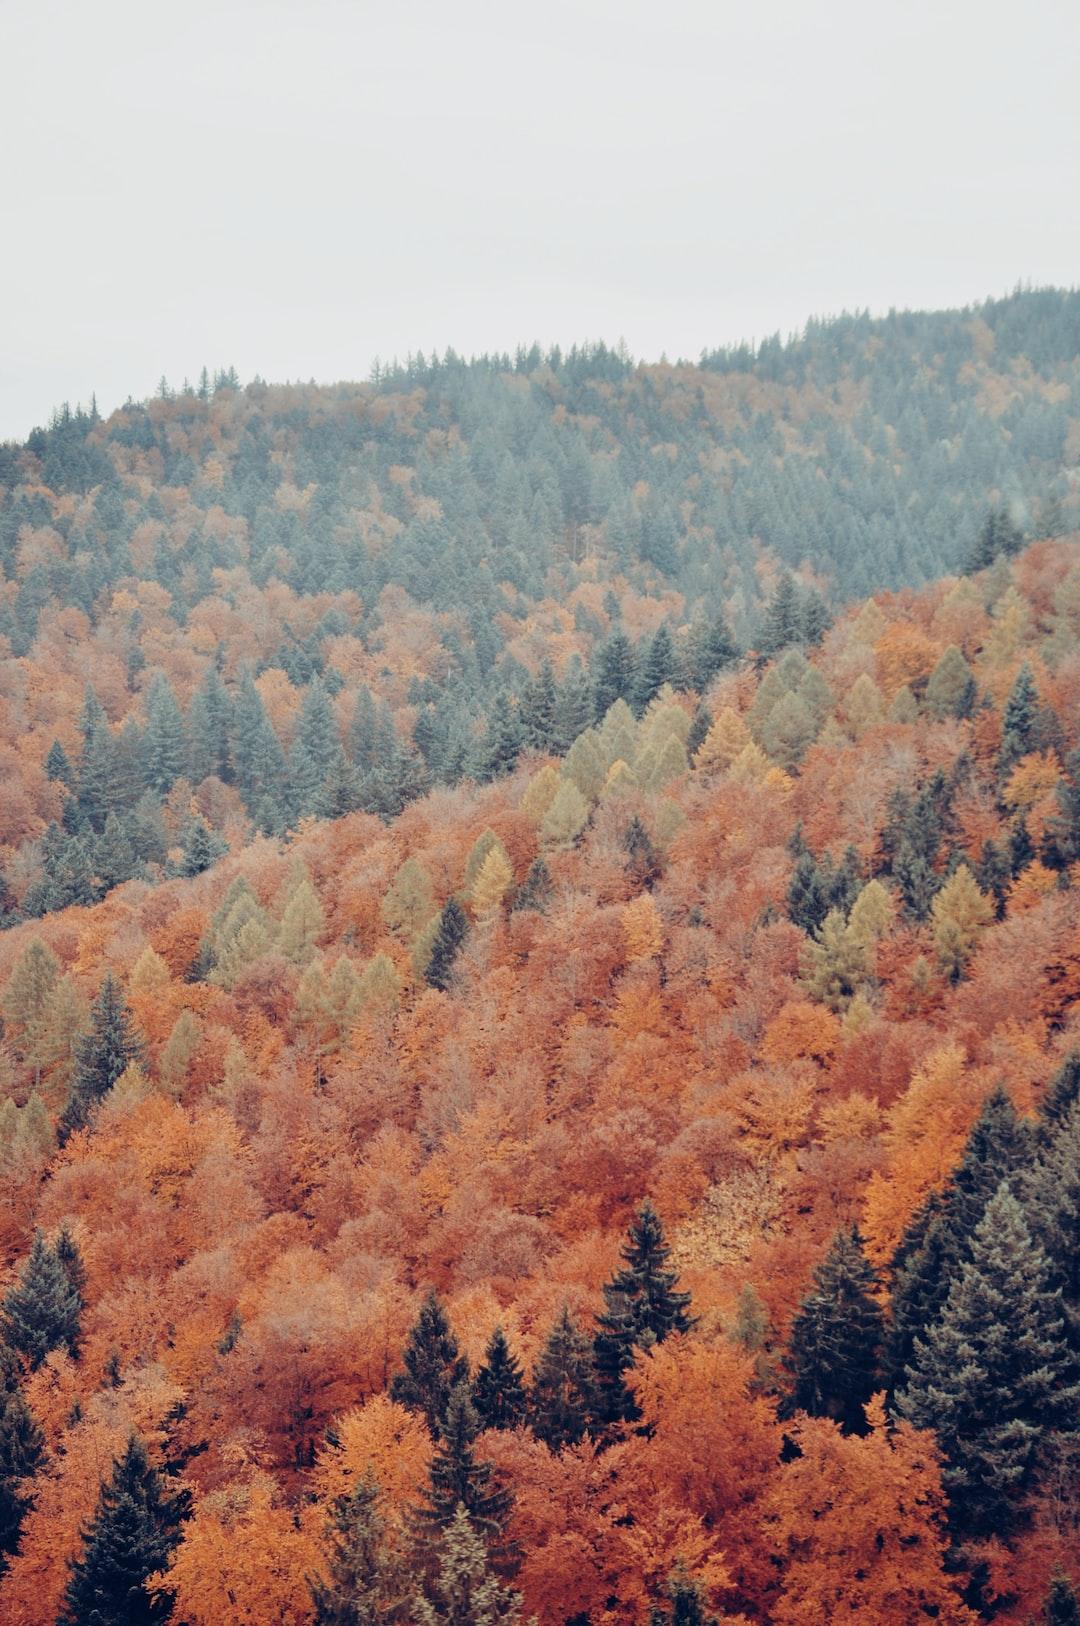 Black Forest texture